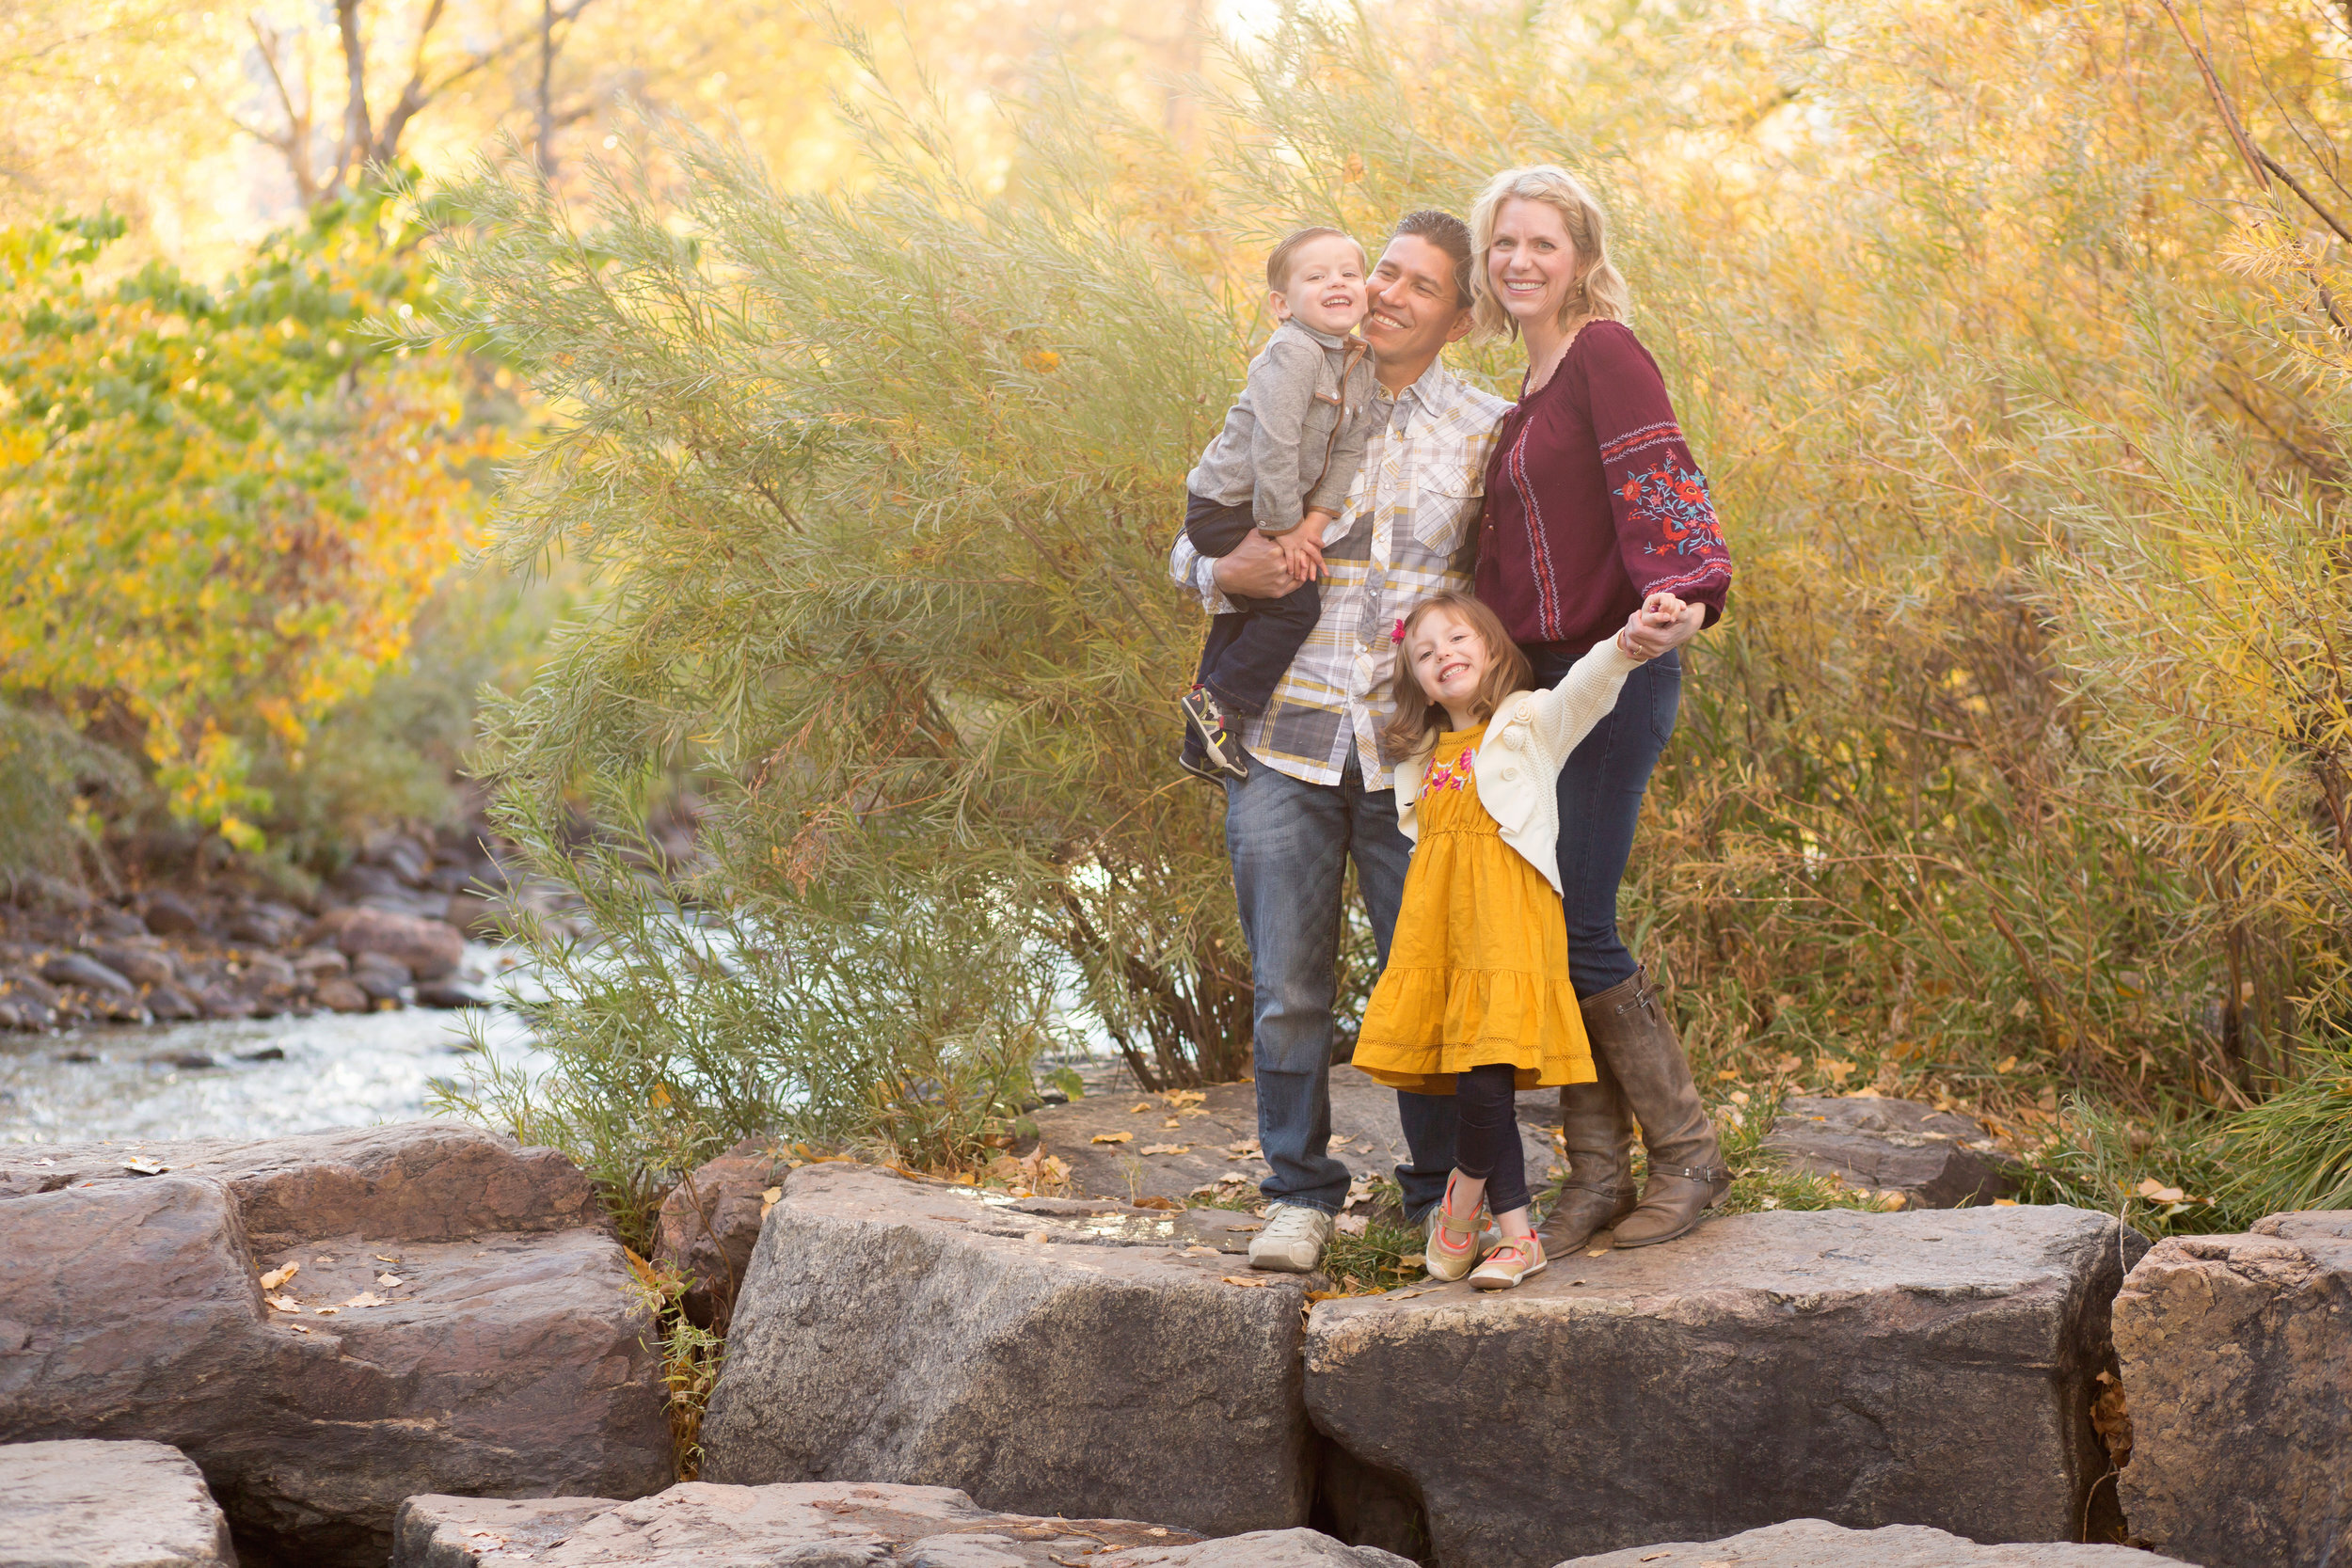 Denver+Maternity+Photographer,+Boulder+Maternity+Photographer,+Boulder+Newborn+Photographer,+Denver+Newborn+Photographer.jpeg